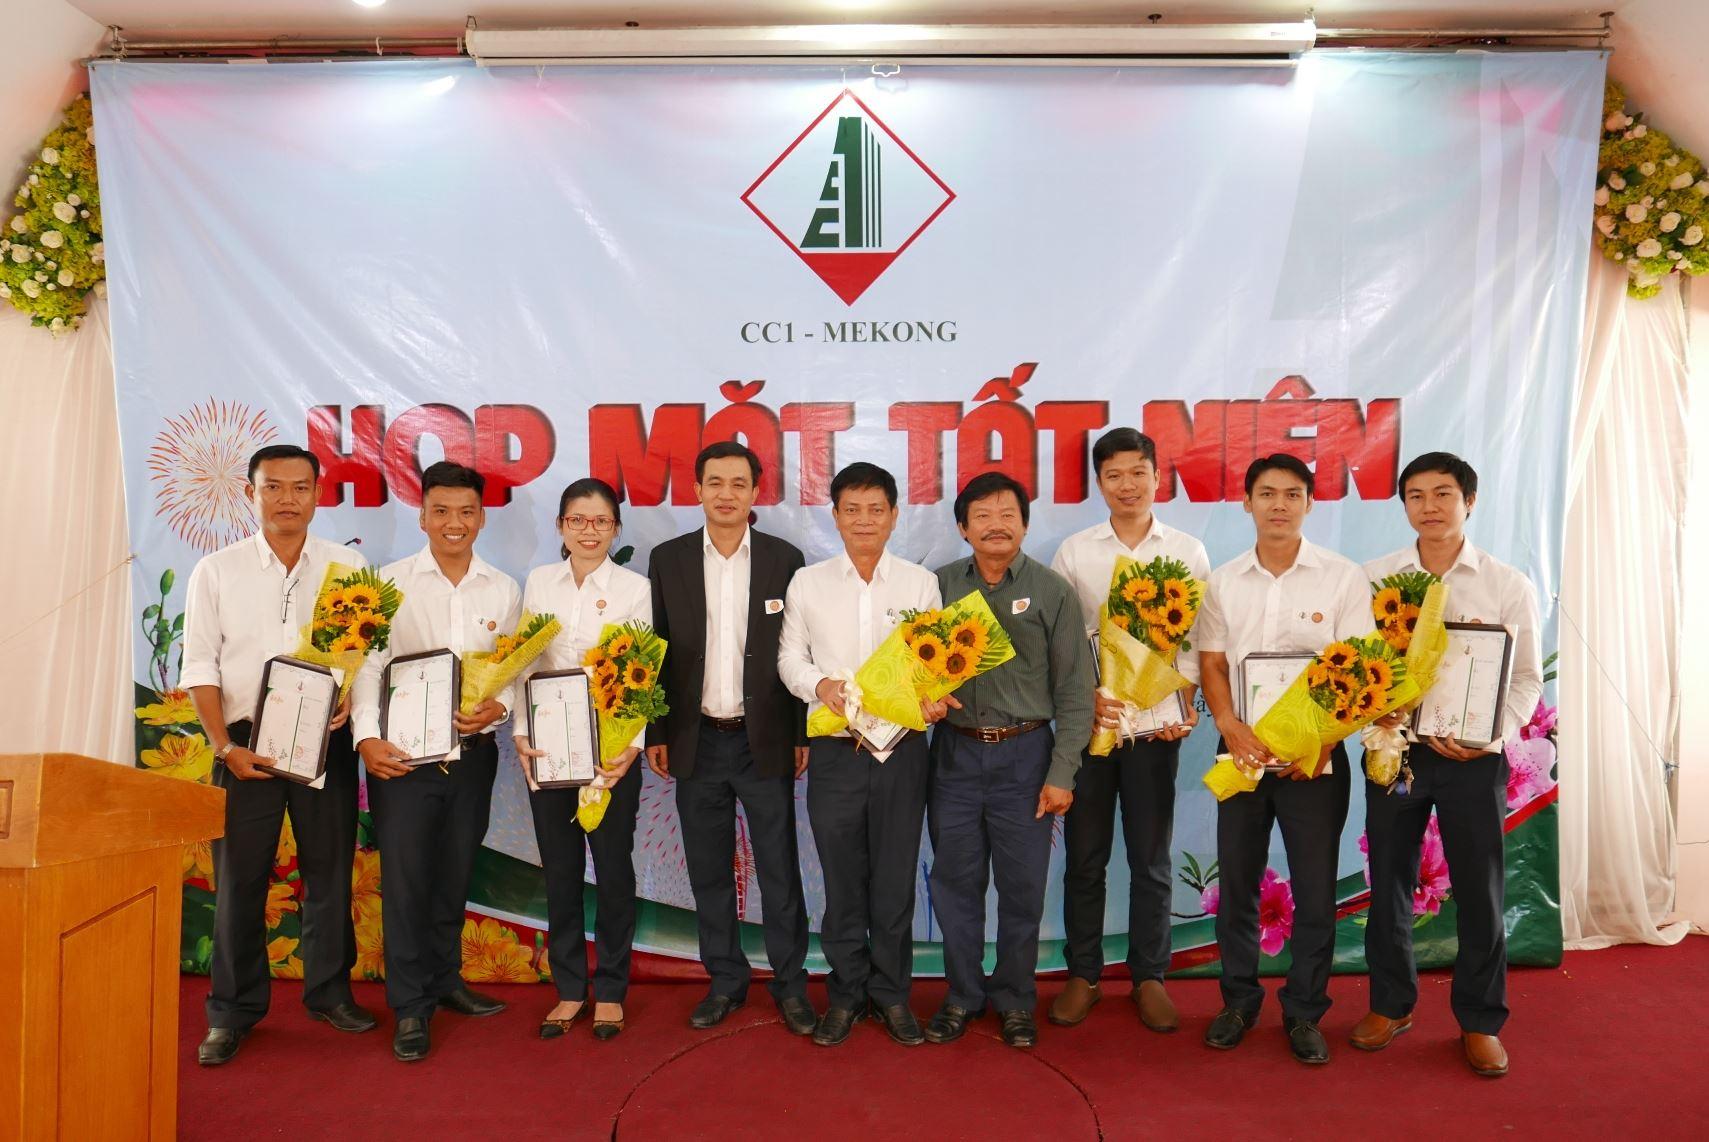 tat-nien-2019-cc1-mekong (17)